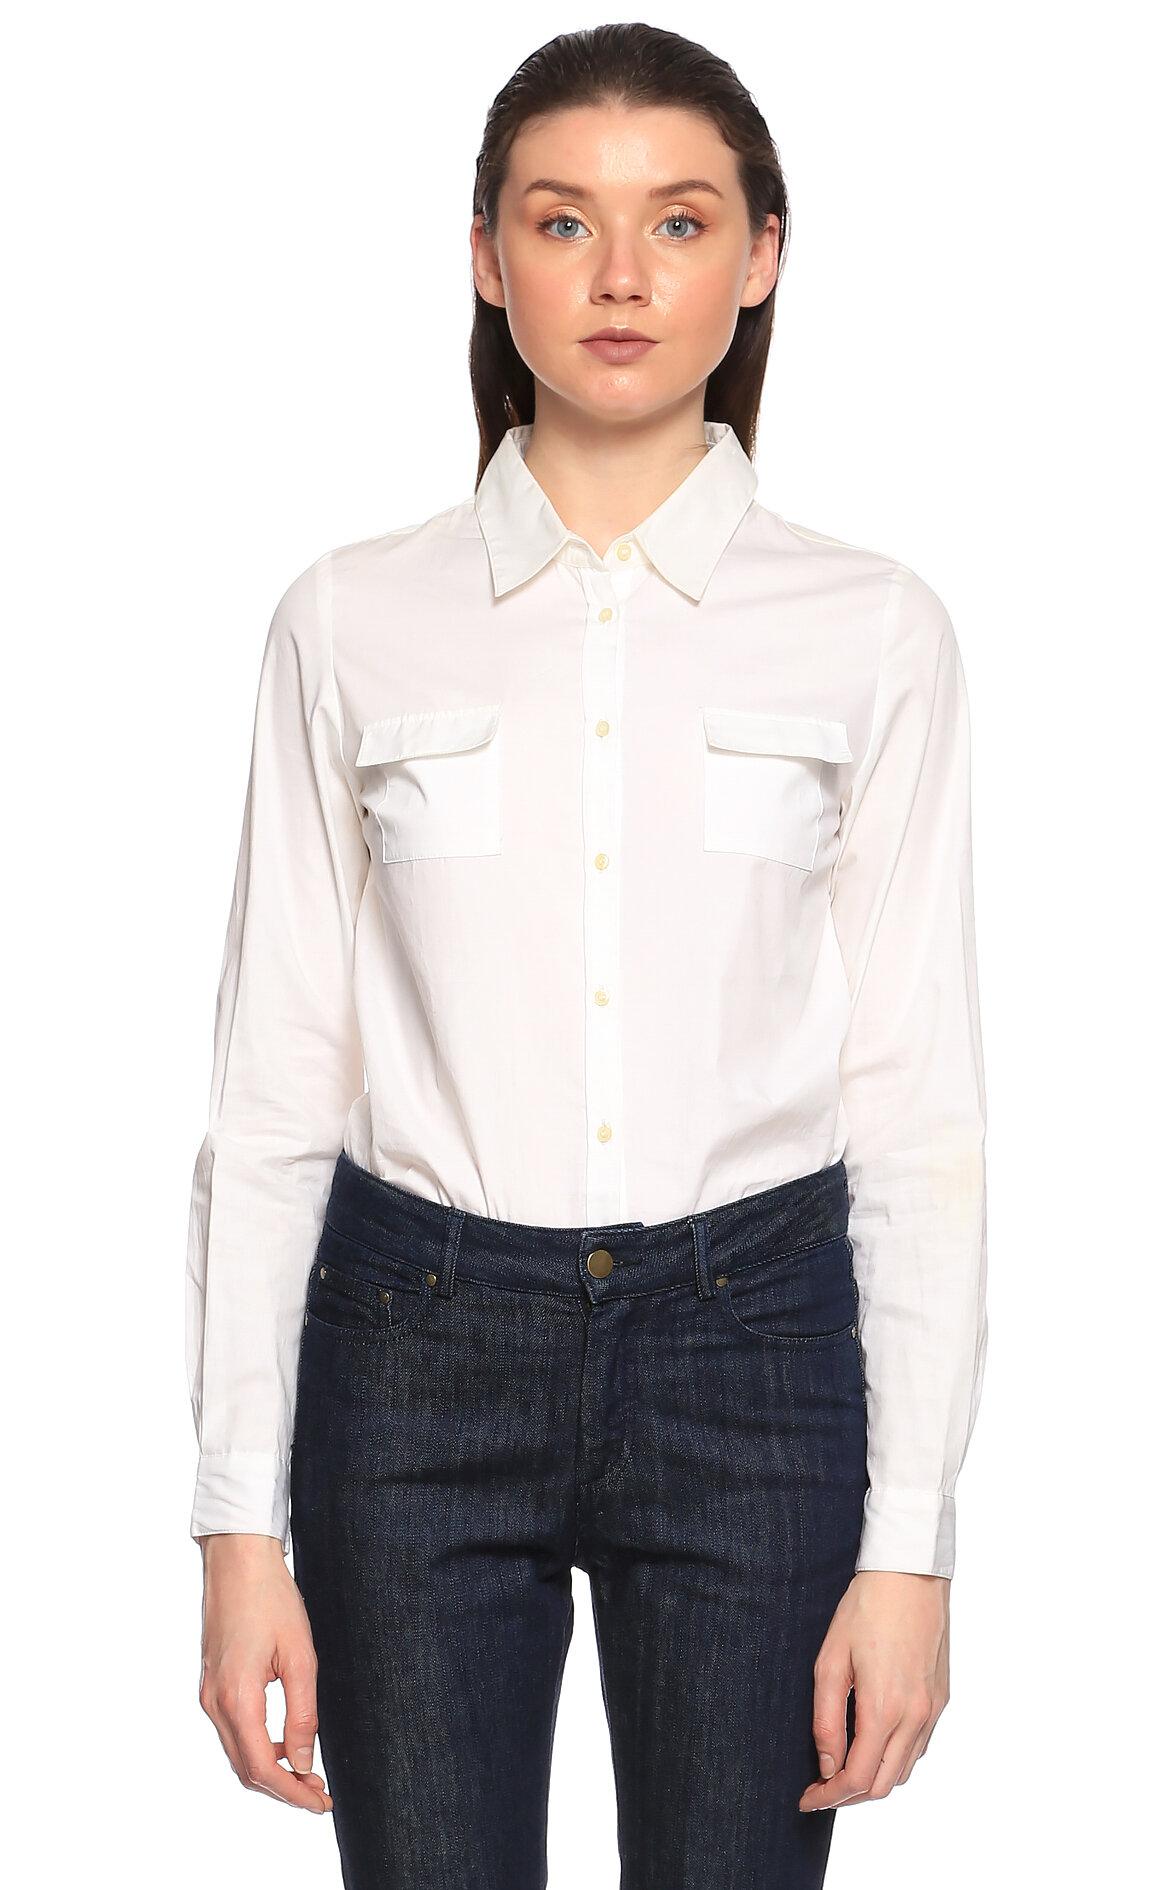 Pablo Cepli Beyaz Gömlek